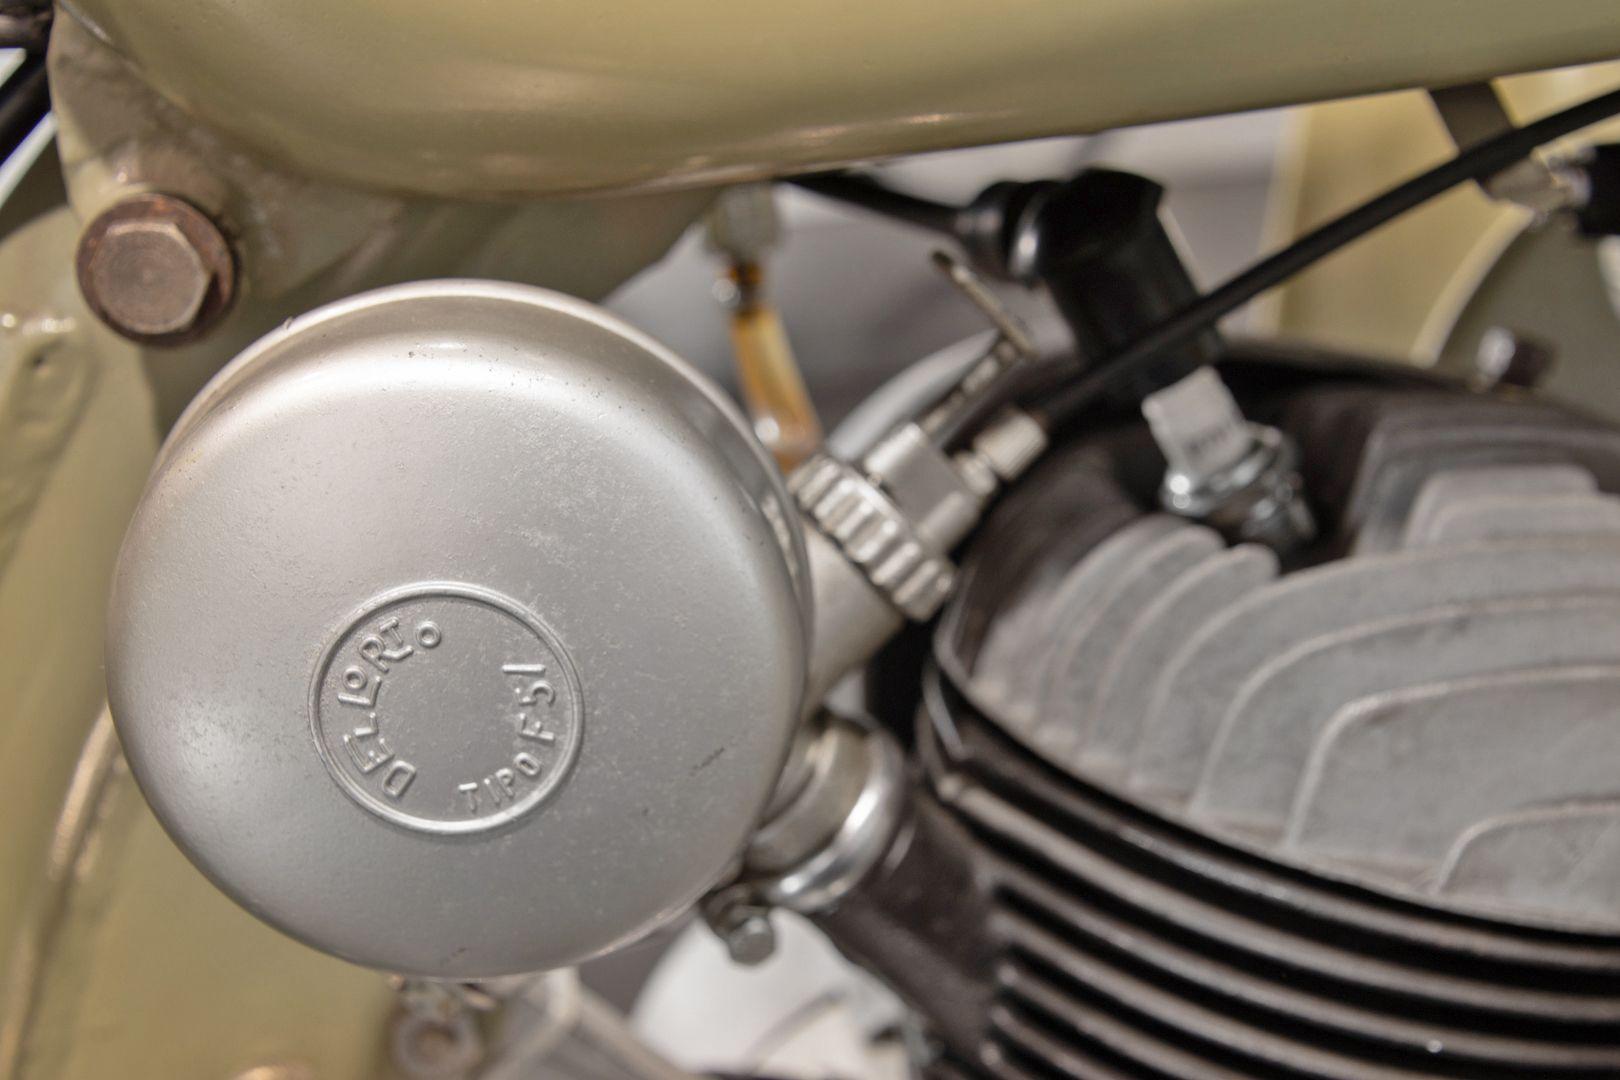 1956 Benelli 125 Leoncino Rikshaws 74335